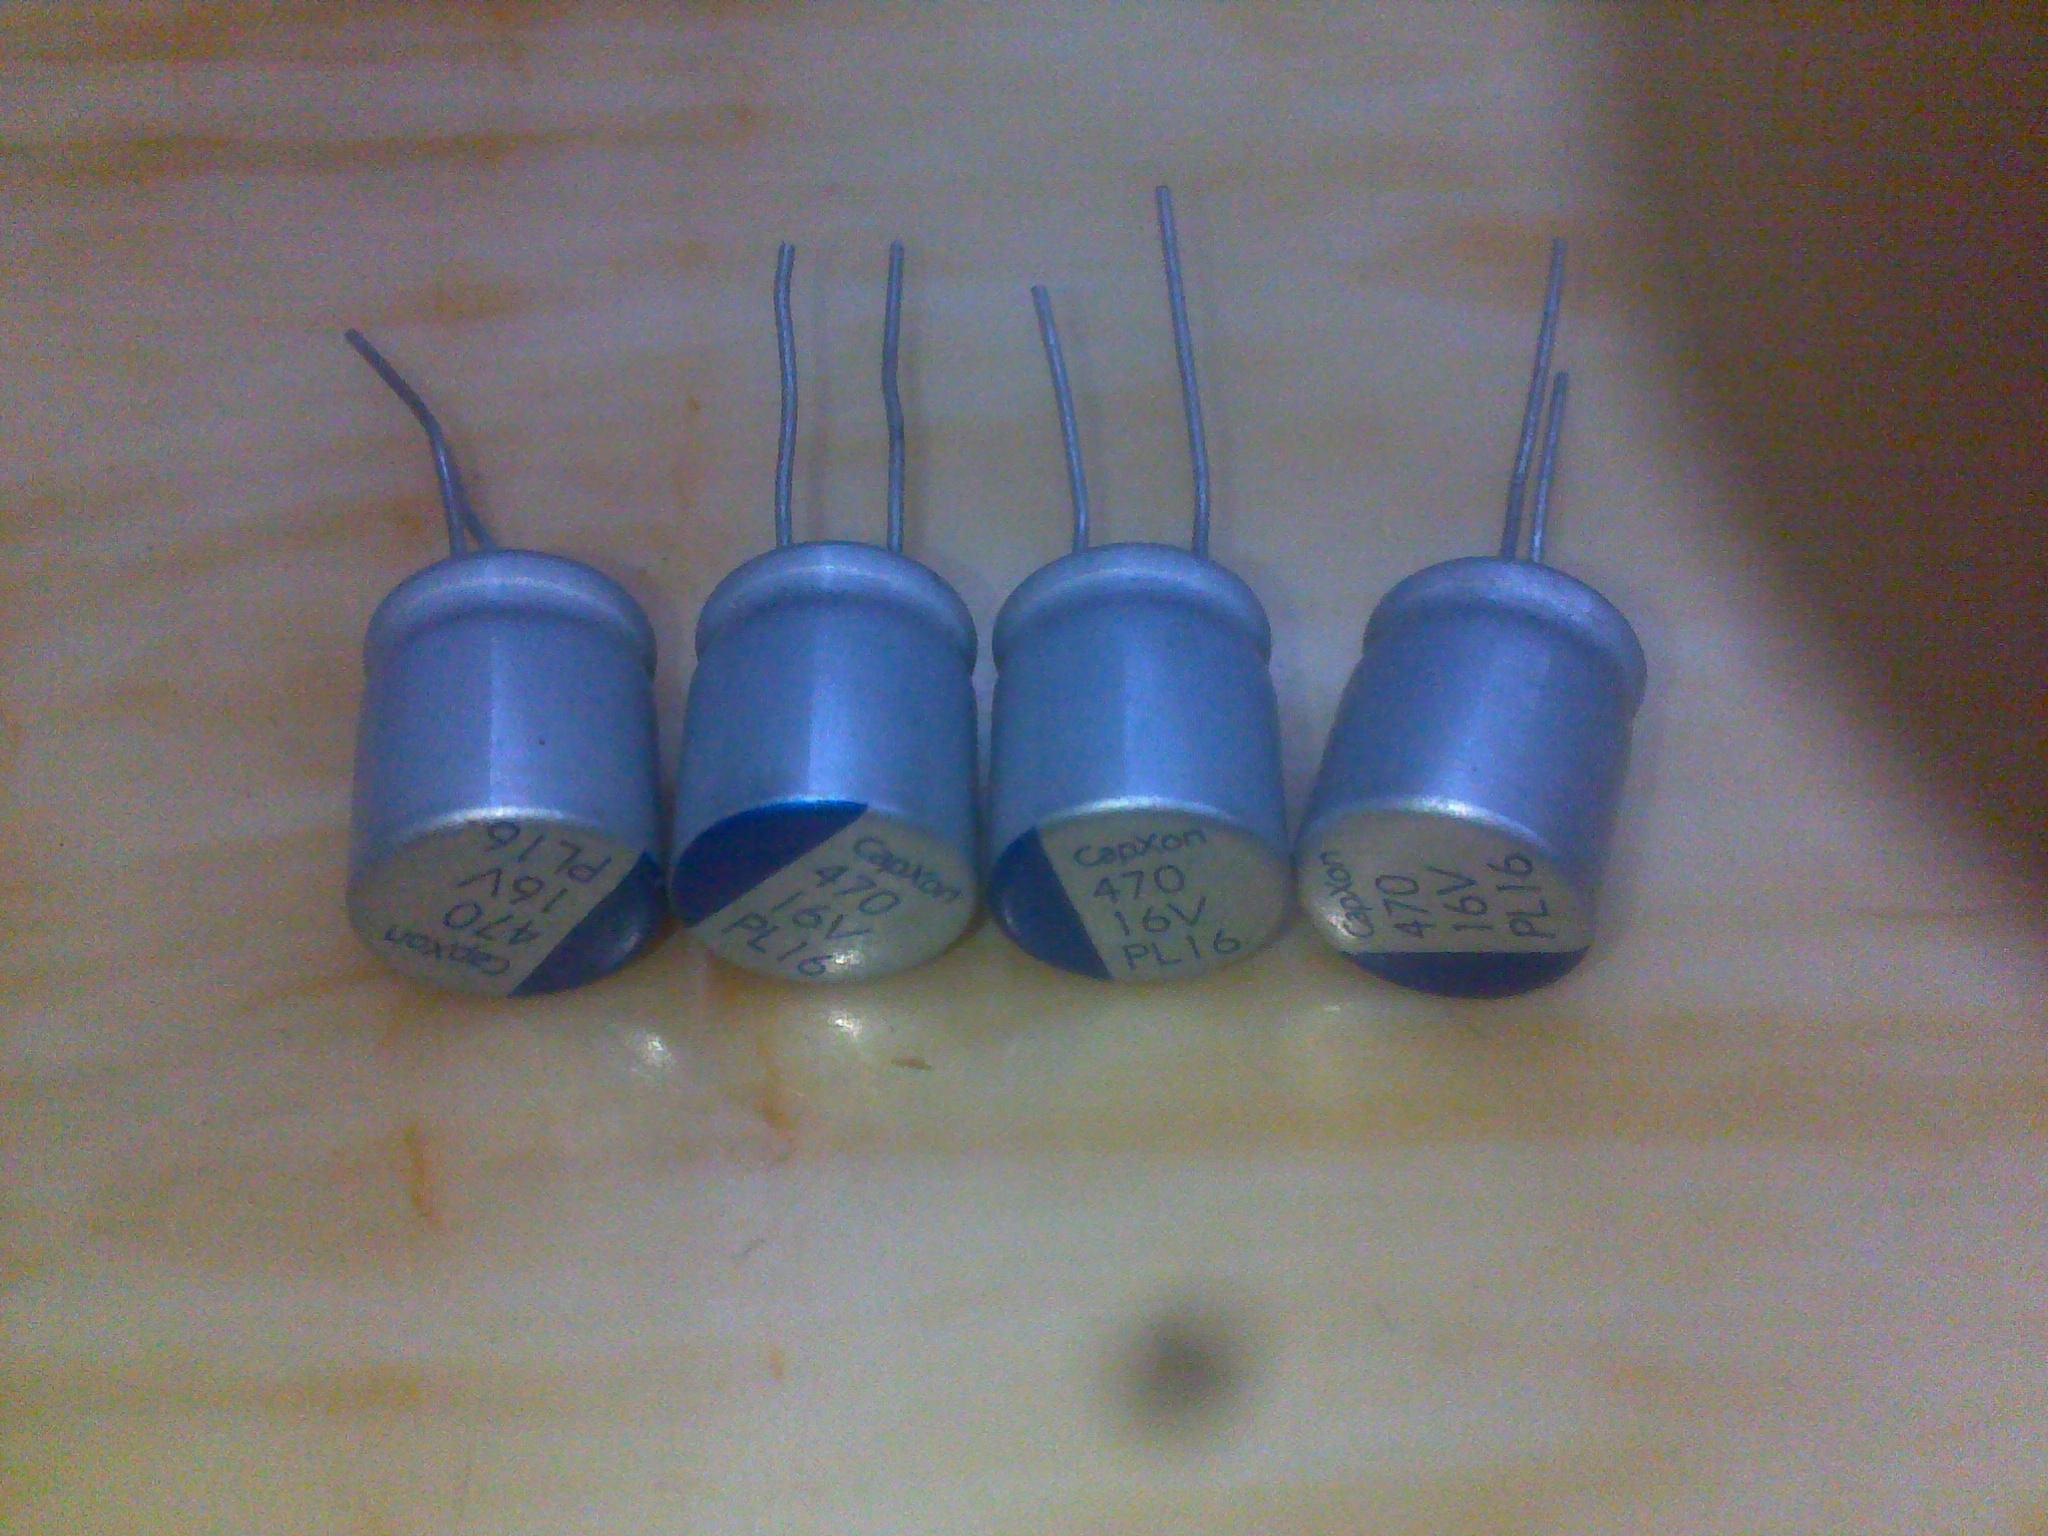 100pcs/lot CAPXON all series solid capacitor polymer capacitor DIP solid capacitor free shipping 100pcs lot fujitsu functional all series solid capacitor polymer capacitor smd solid capacitor free shipping